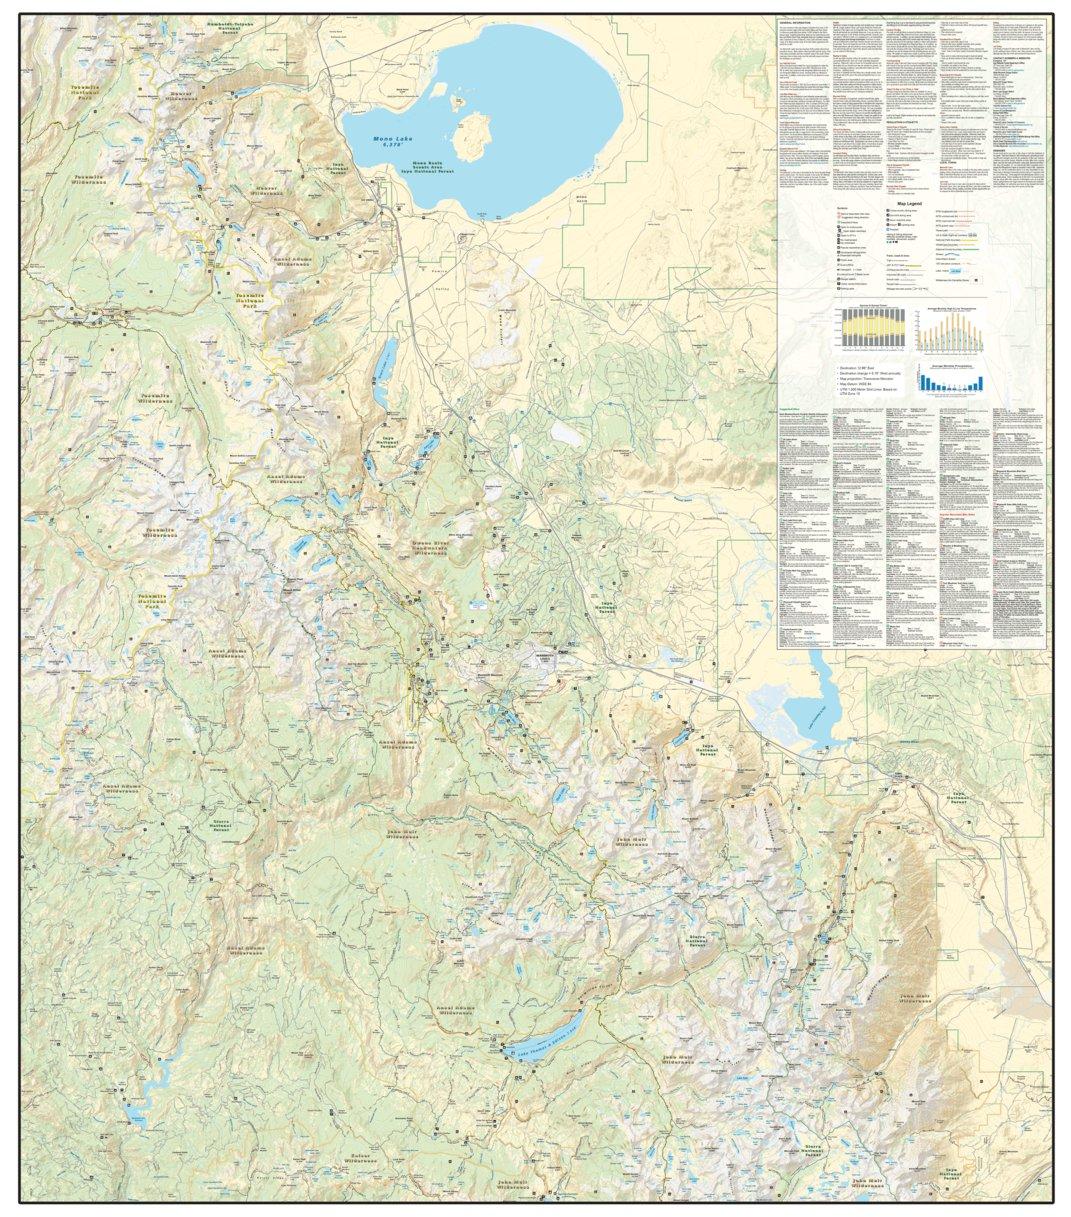 Mammoth Lakes California Trail Map - Adventure Maps, Inc ... on big pine map, tempe lake map, hope ranch map, lake tahoe map, mono county map, riverbank map, pinon hills map, yosemite national park map, hayfork map, big bear map, mountain ranch map, california map, mt laguna map, fish camp map, june lake map, mammoth mountain map, laguna village map, gavilan hills map, mammoth village map, trinidad state beach map,